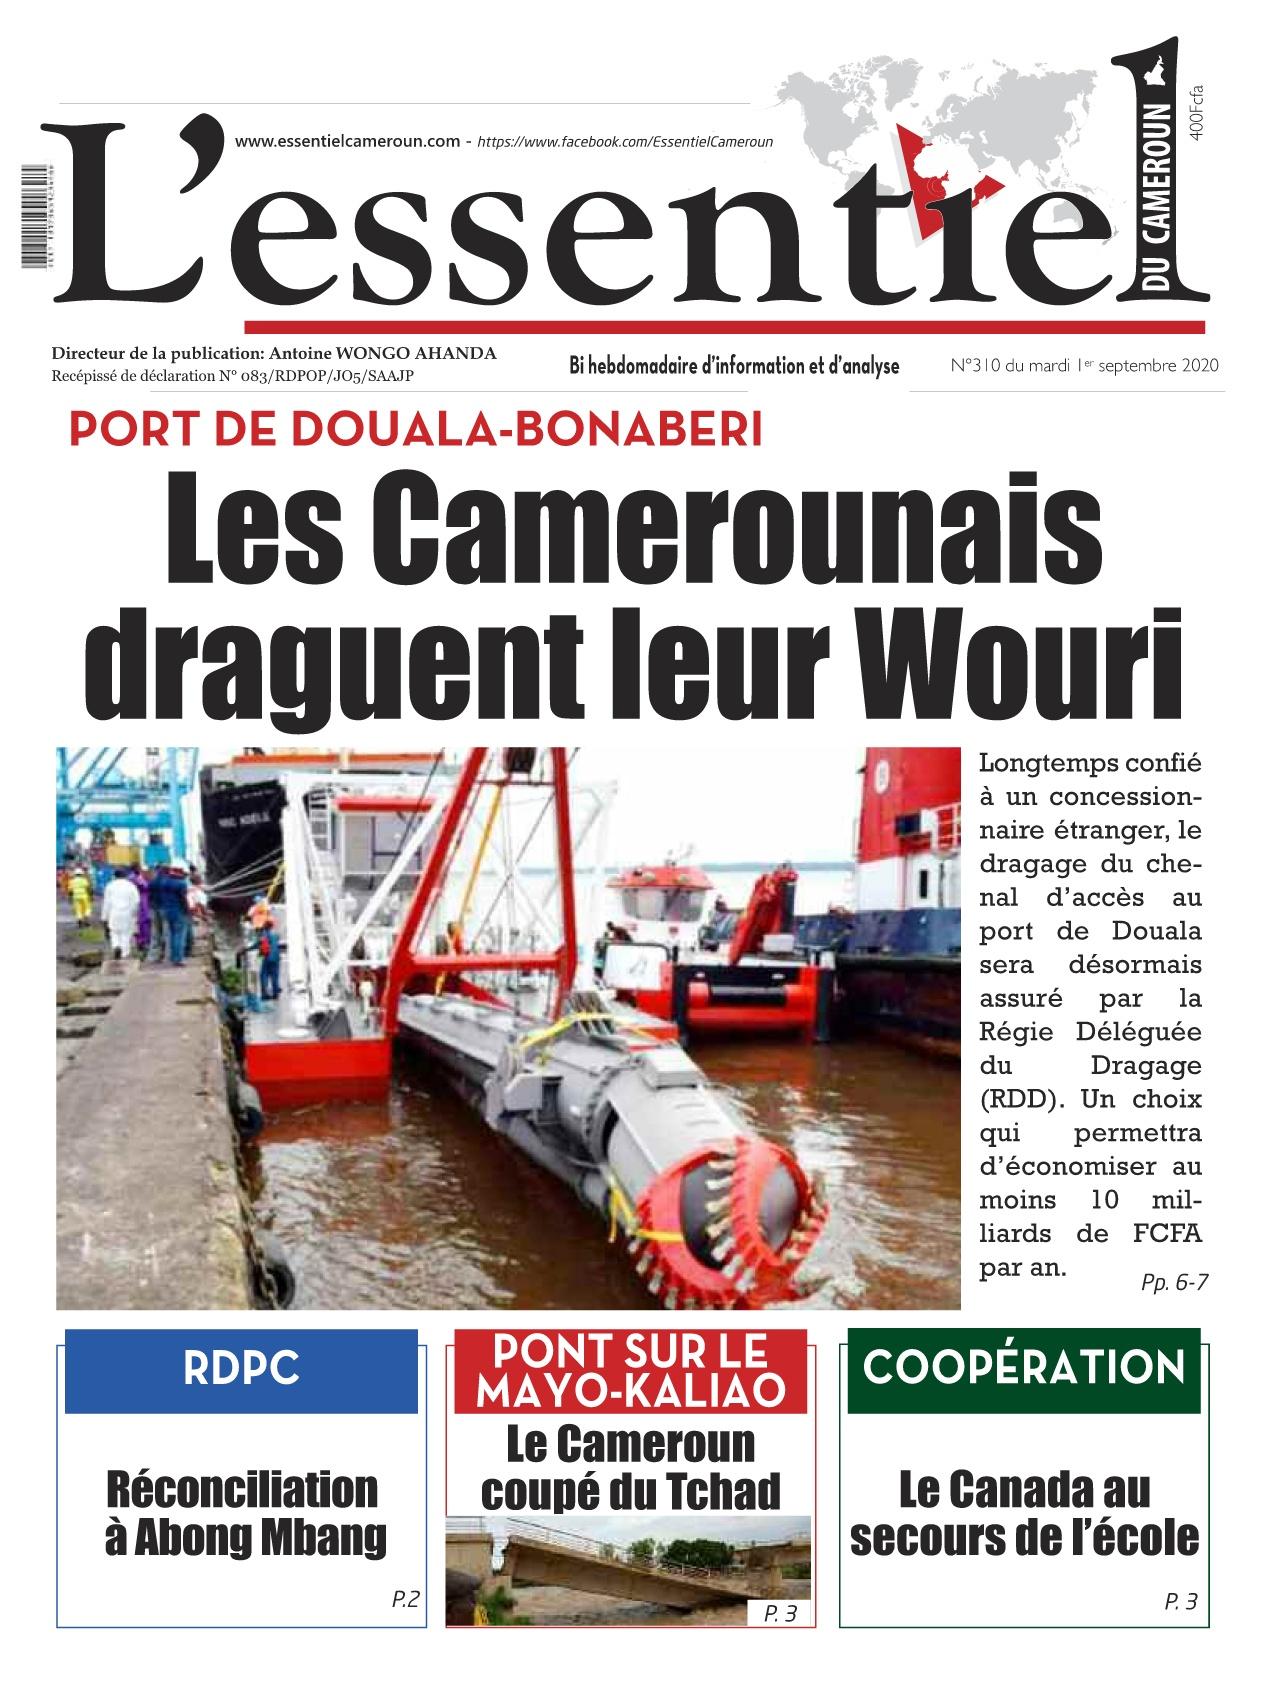 L'essentiel du Cameroun - 01/09/2020